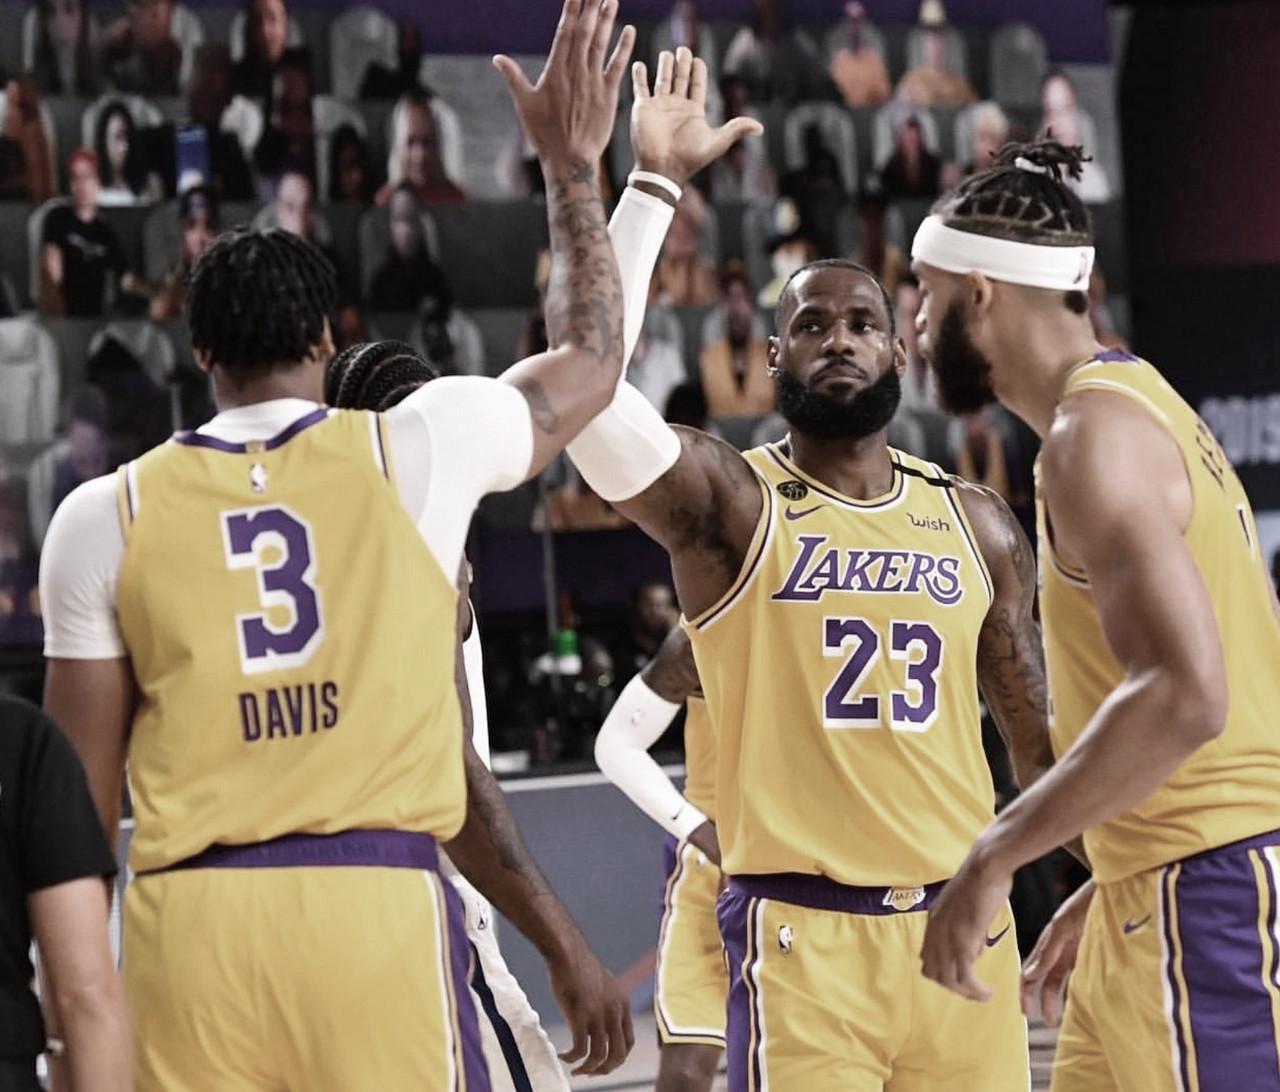 CRÓNICA: Un pobre LeBron James da la victoria a los Lakers